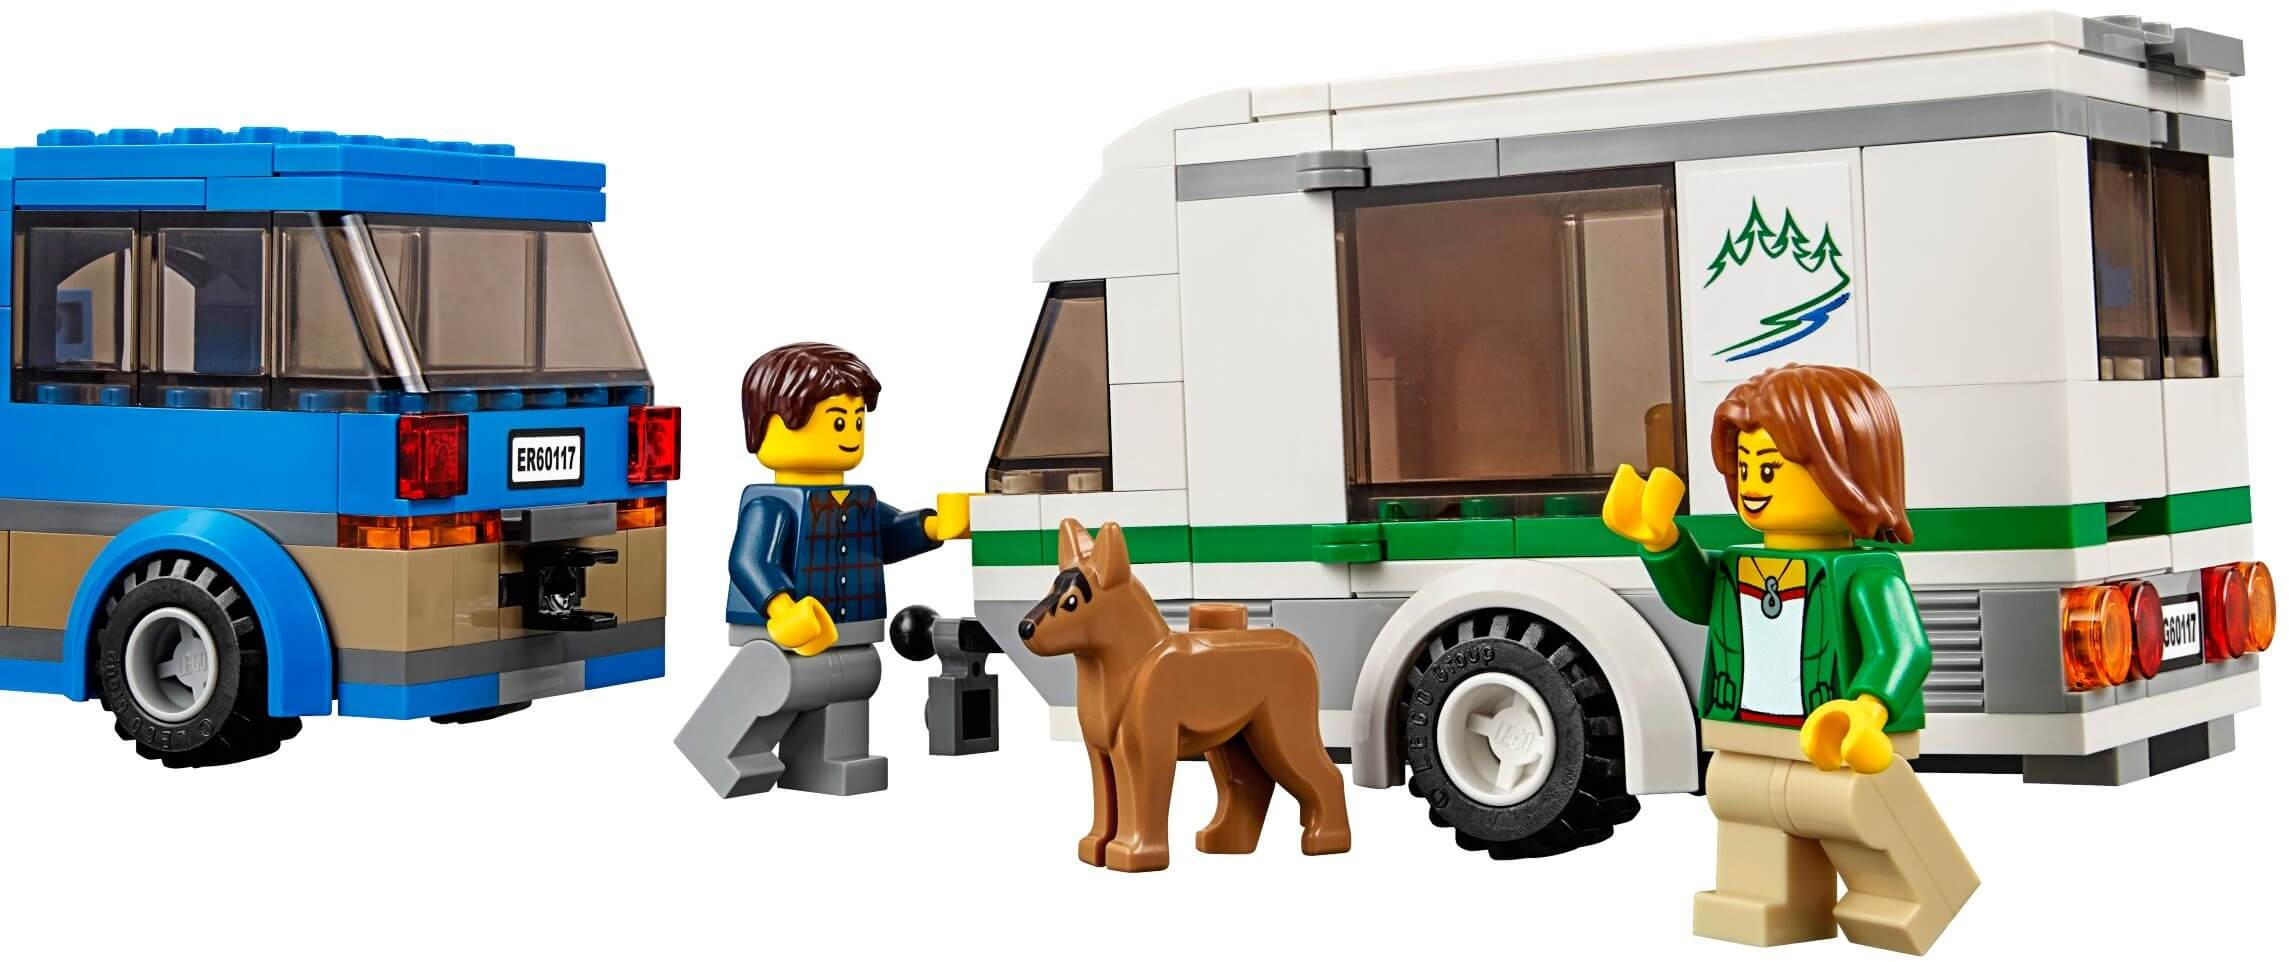 Mua đồ chơi LEGO 60117 - LEGO City 60117 - Xe lưu động dã ngoại (LEGO City Van & Caravan 60117)